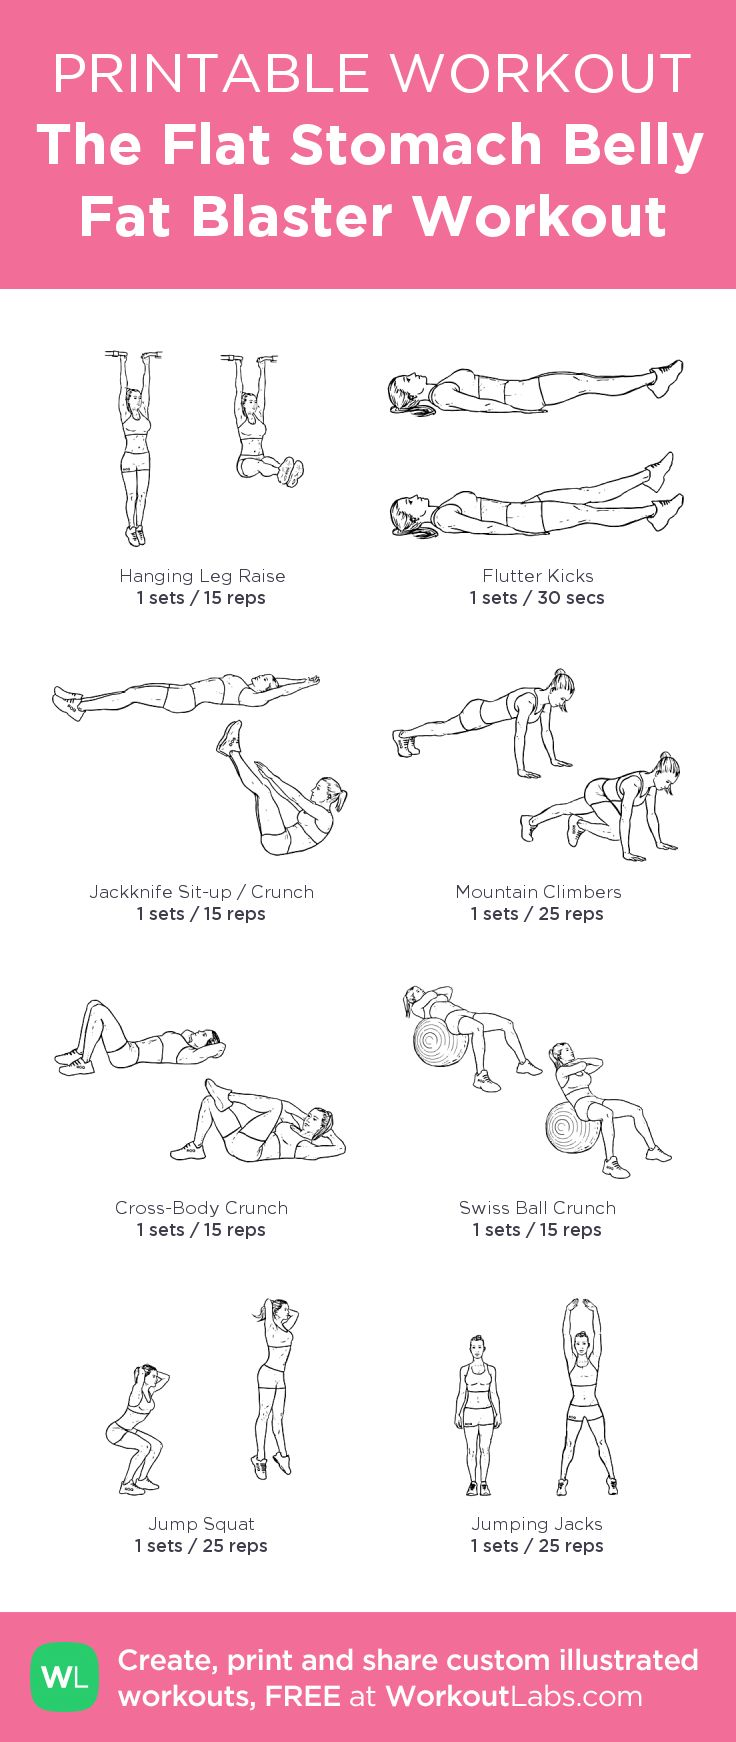 The Flat Stomach Belly Fat Blaster Workout: my custom printable workout by @WorkoutLabs #workoutlabs #customworkout